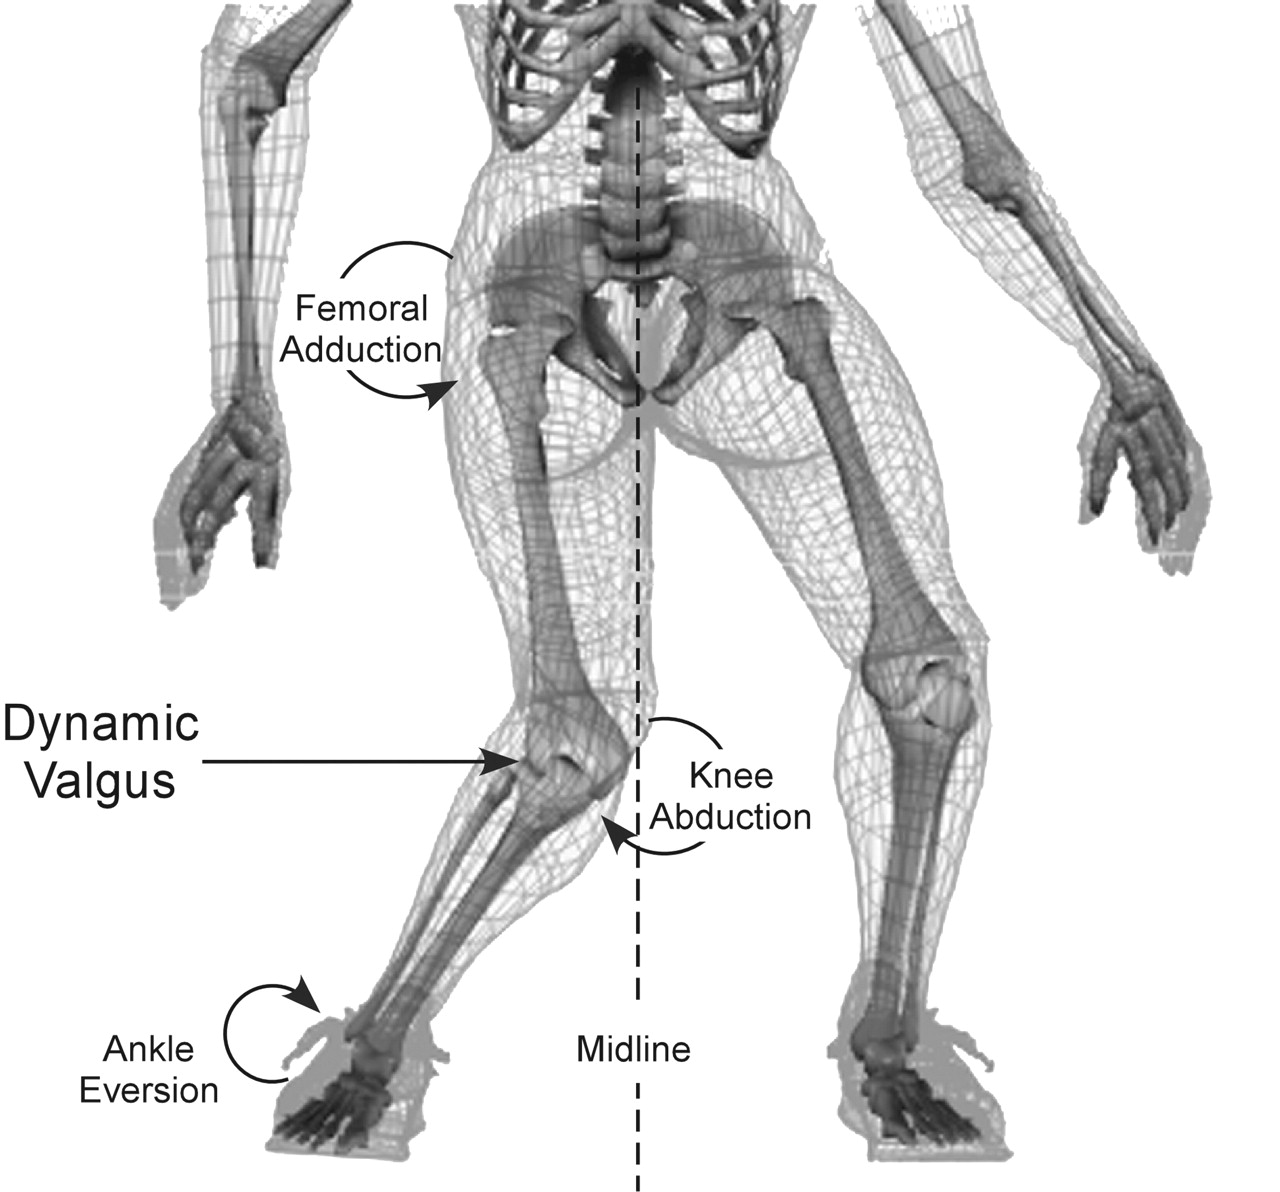 Thera-Band exercise program can improve lower limb biomechanics in ...